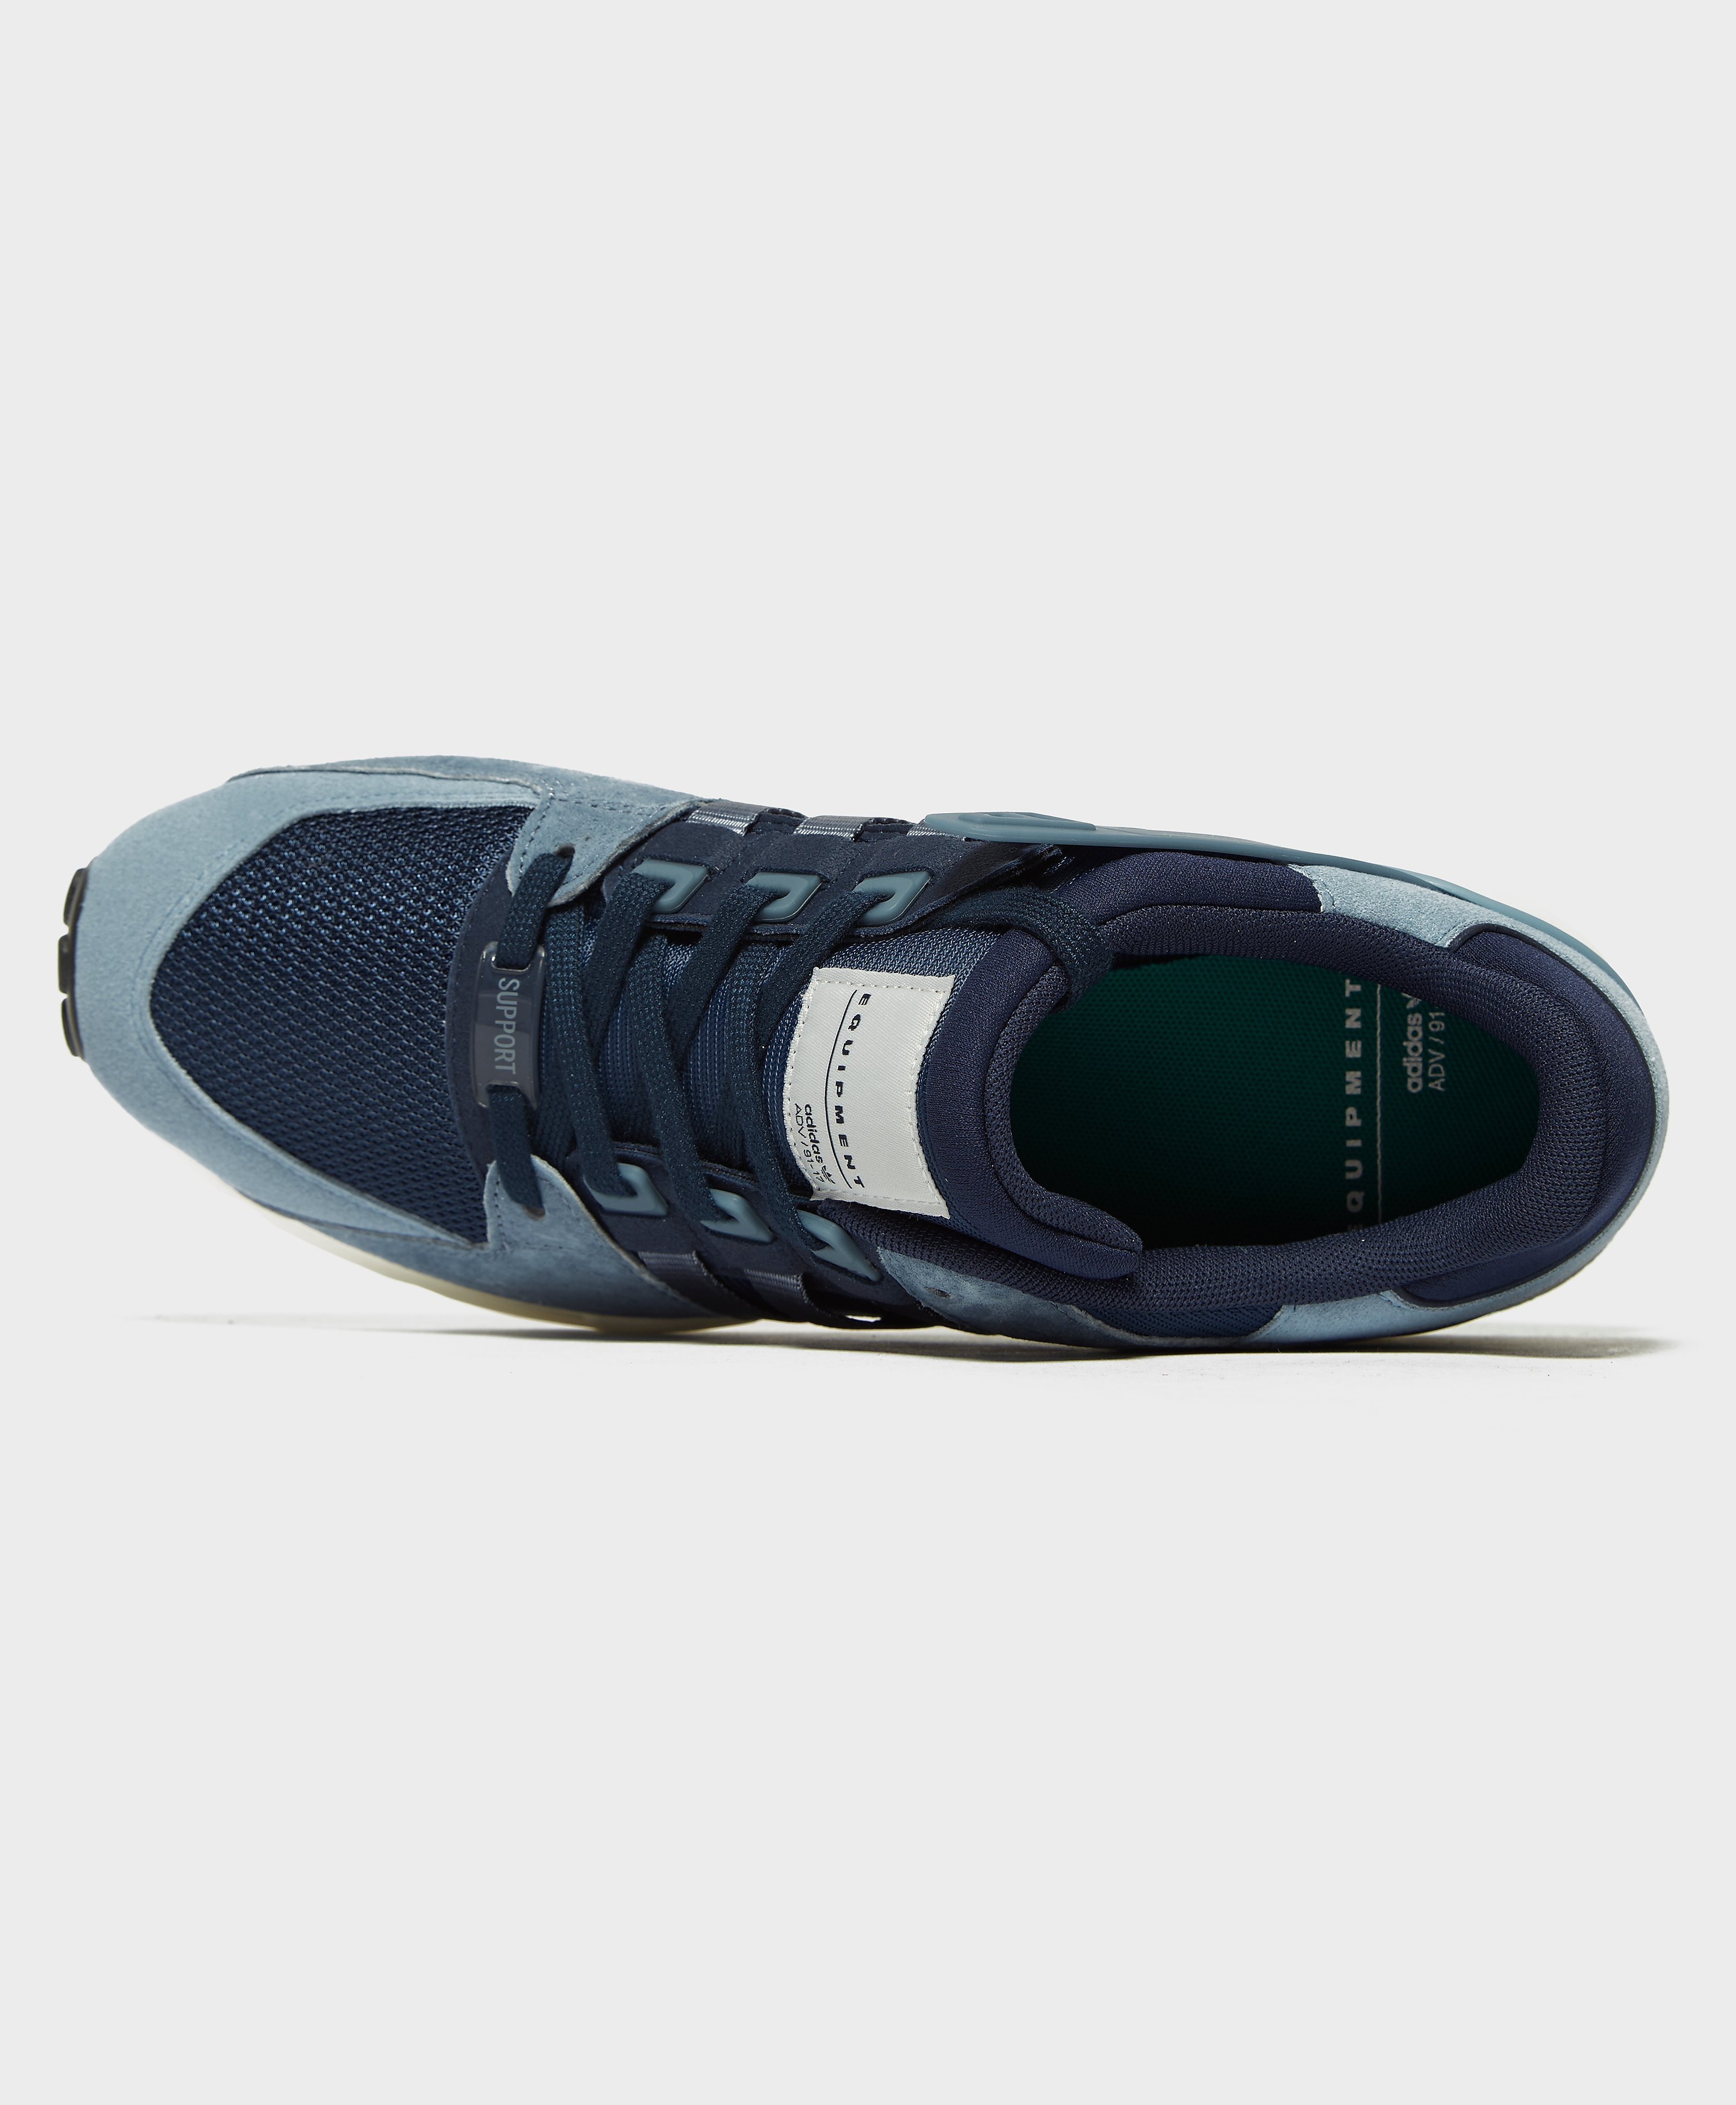 adidas Originals EQT Running Support 93